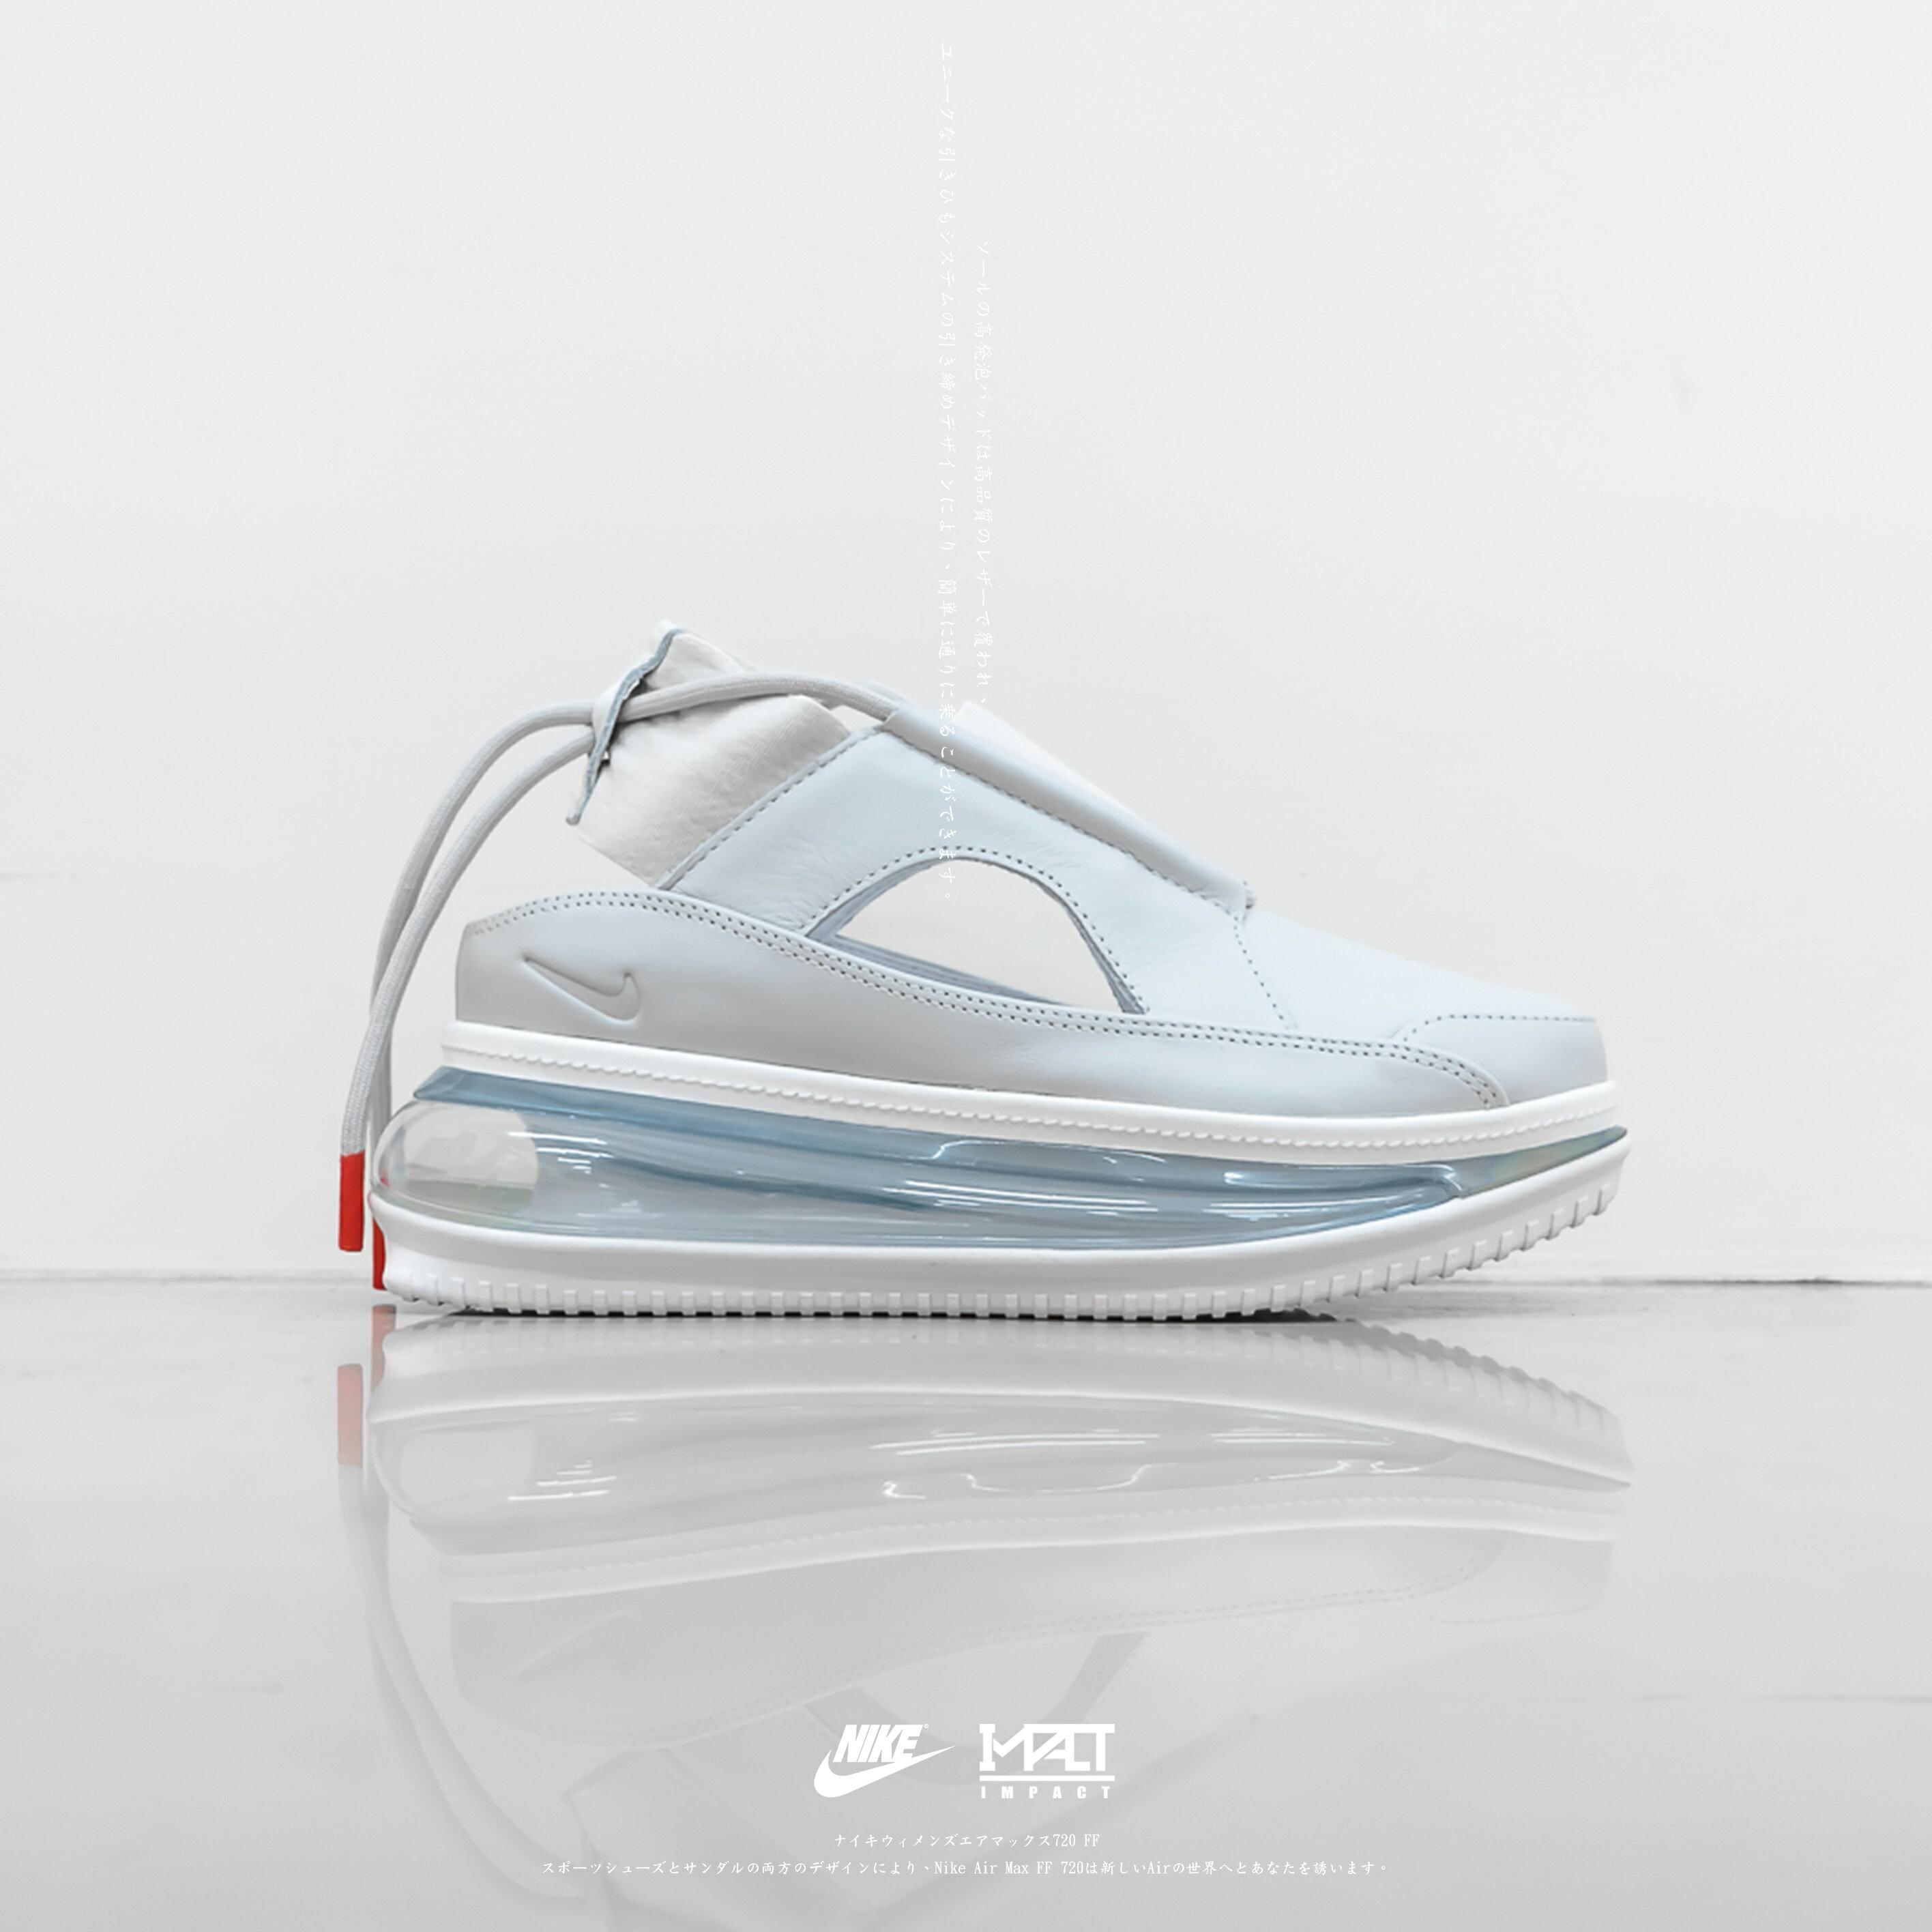 【限時滿$1,500↘再折$150】IMPACT Nike Wmns Air Max 720 FF 白 涼鞋 厚底 增高 氣墊 皮質 AO3189-100